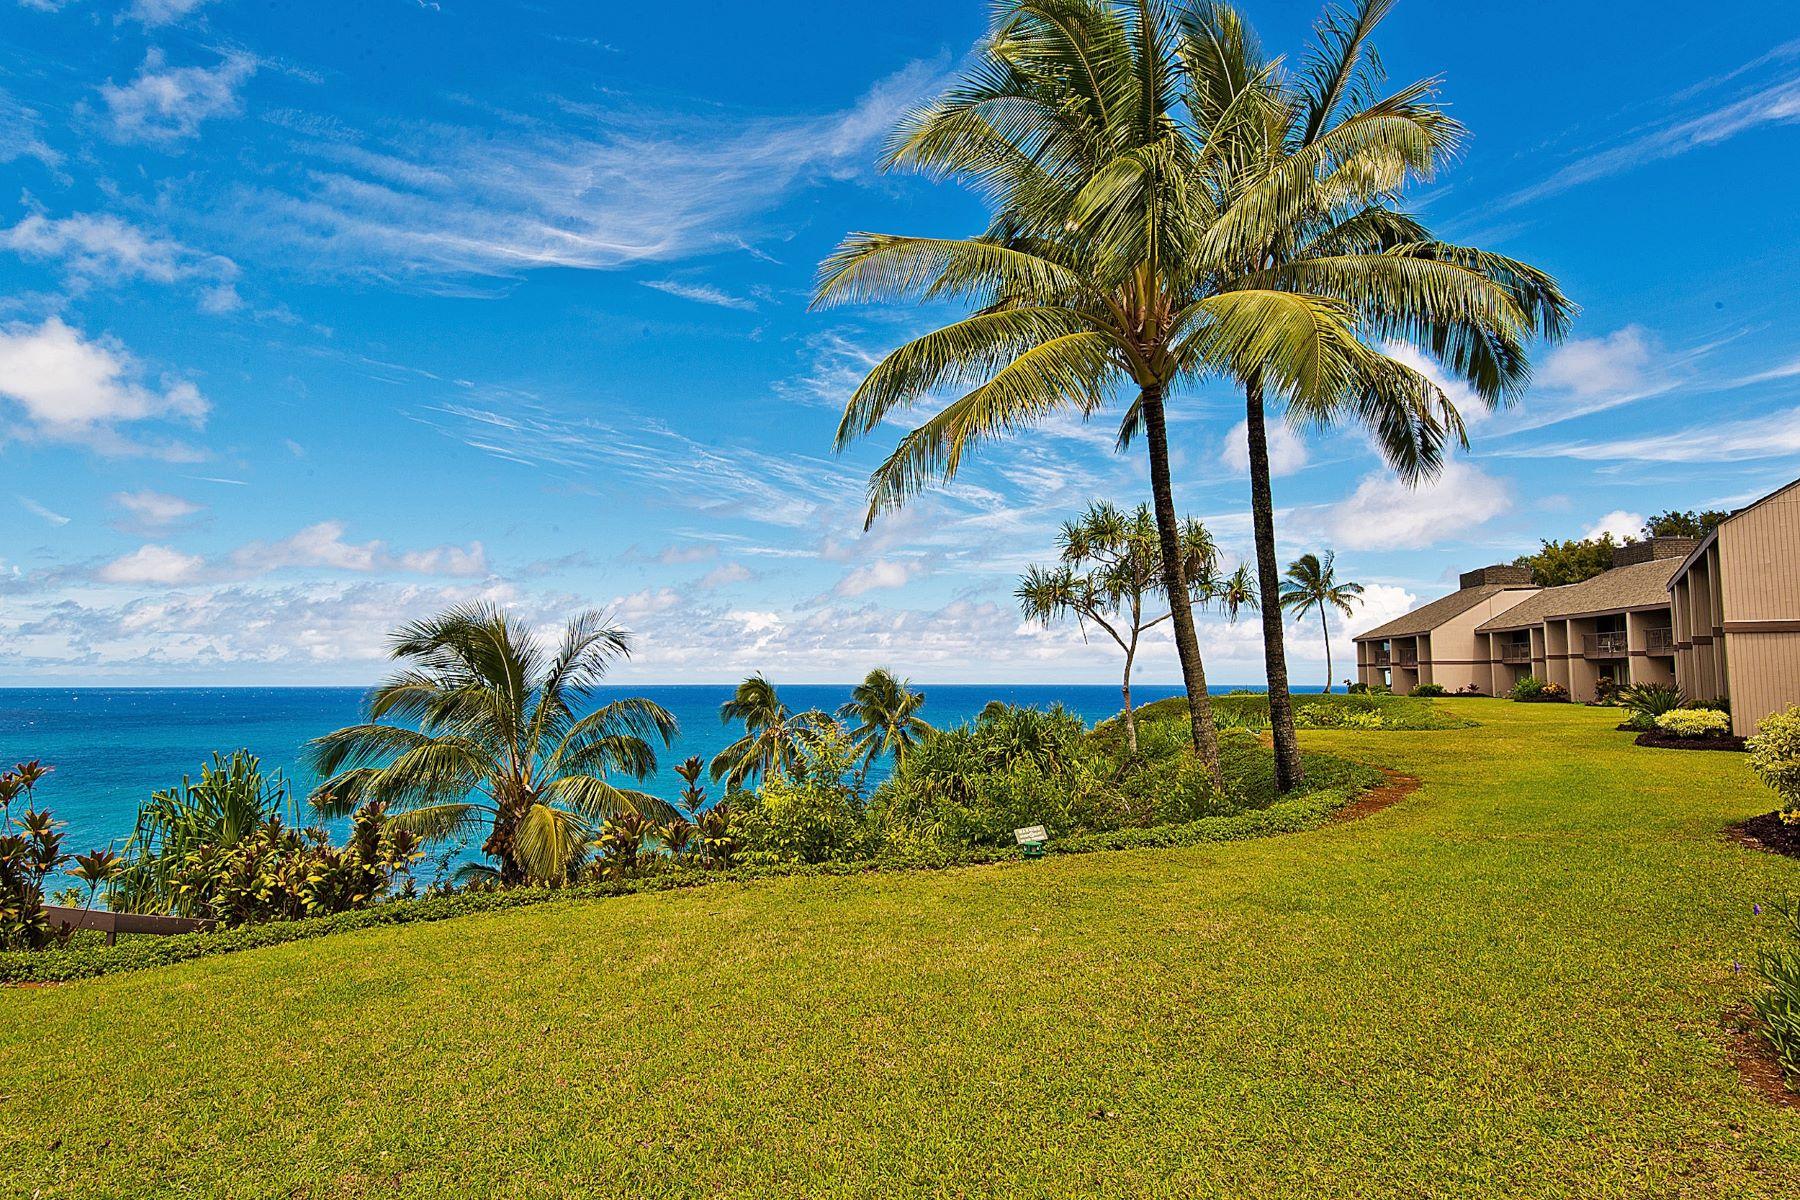 Condomínio para Venda às Pali Ke Kua 5300 Ka Haku Rd #107 Princeville, Havaí, 96722 Estados Unidos